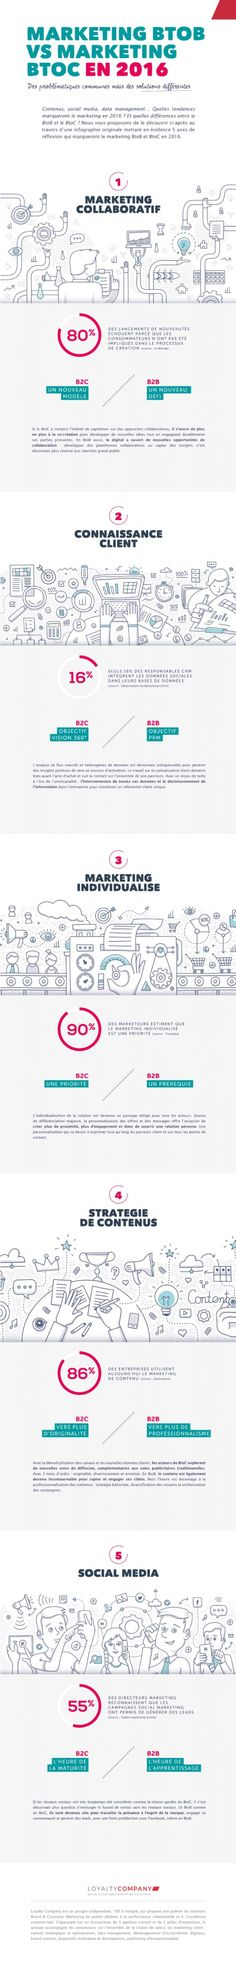 infographie-BtoB-BtoC-5-tendances-marketing-